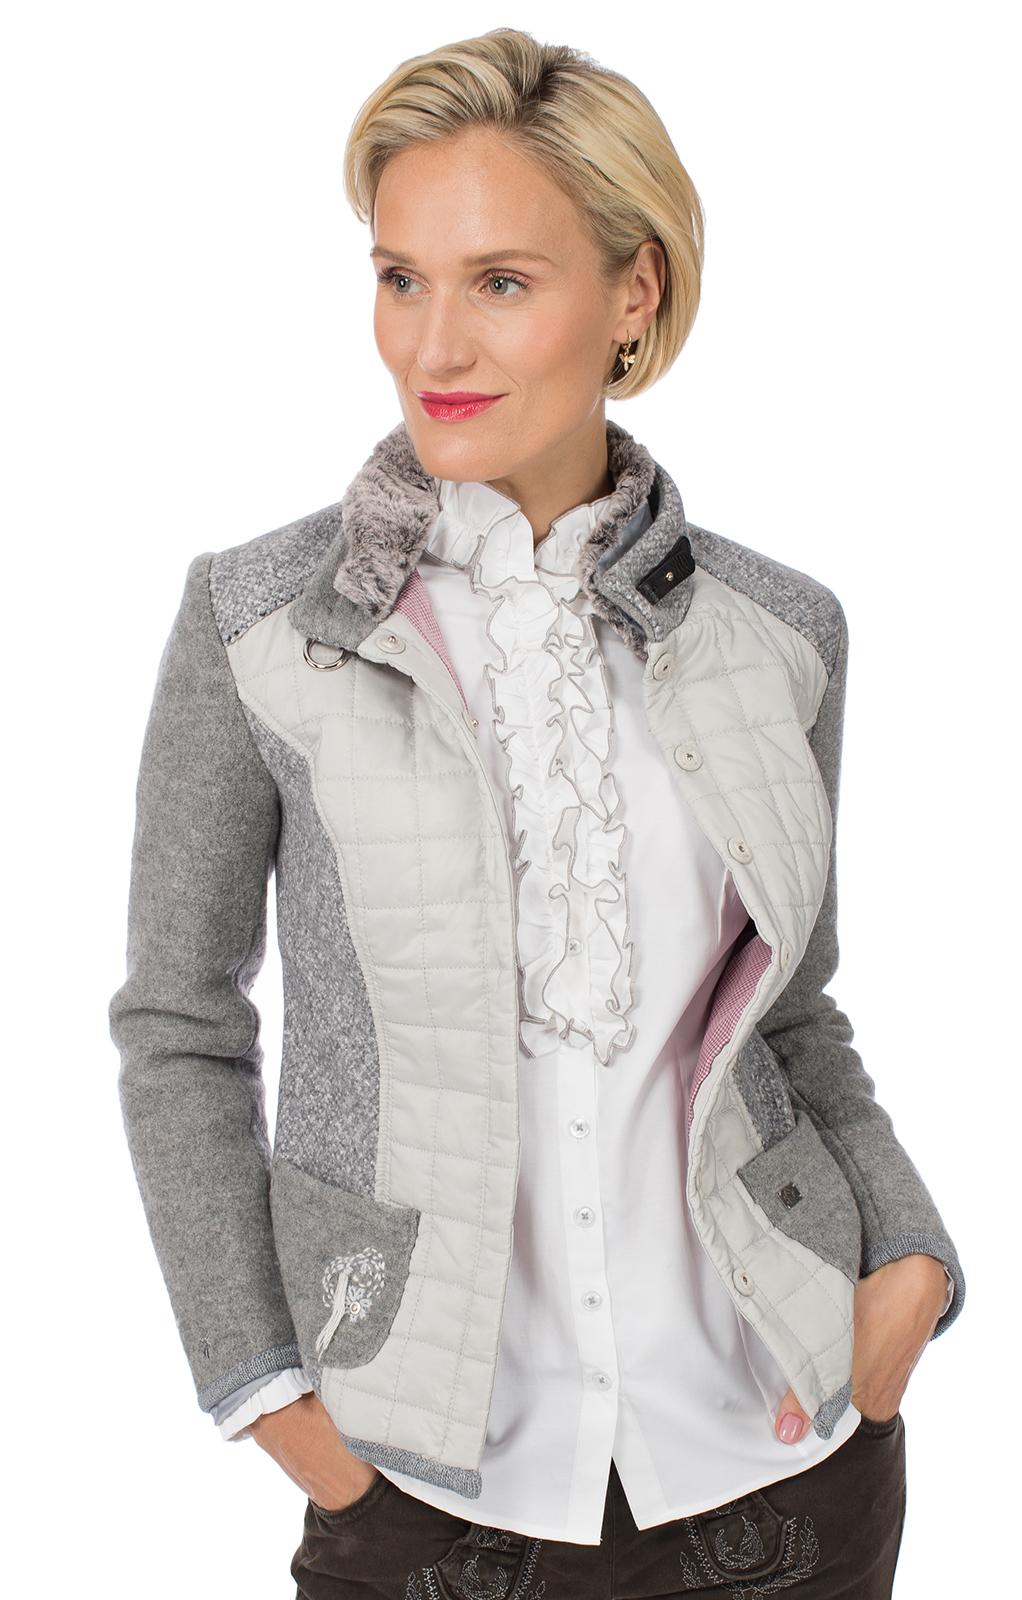 Traditonal Jacket Heubach gray von Spieth & Wensky